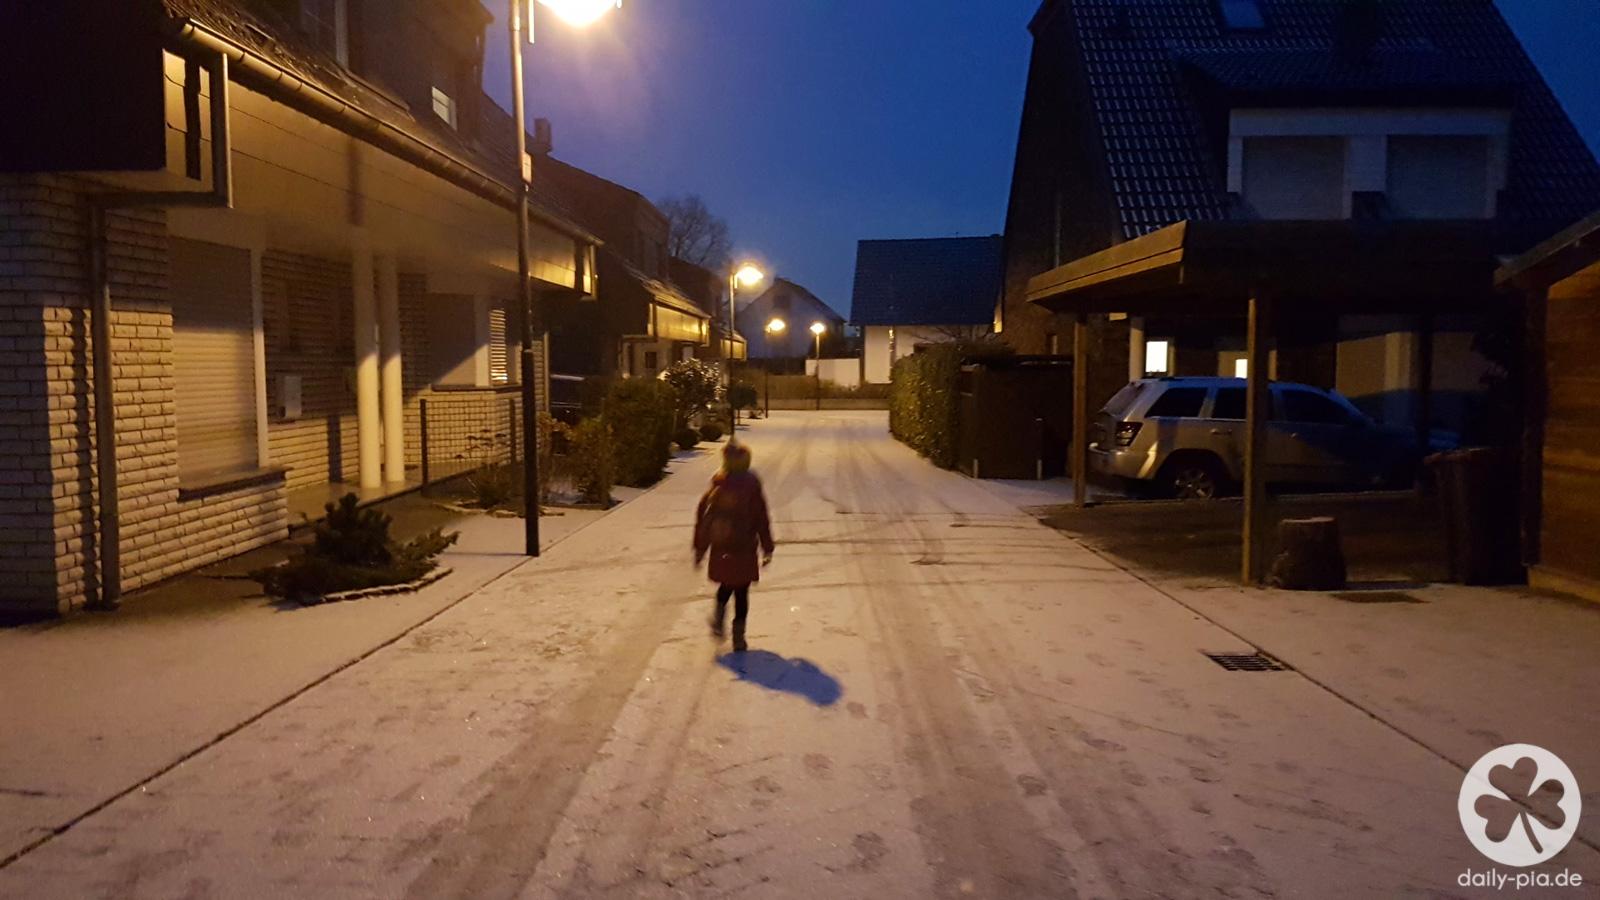 Verheerender Wintereinbruch